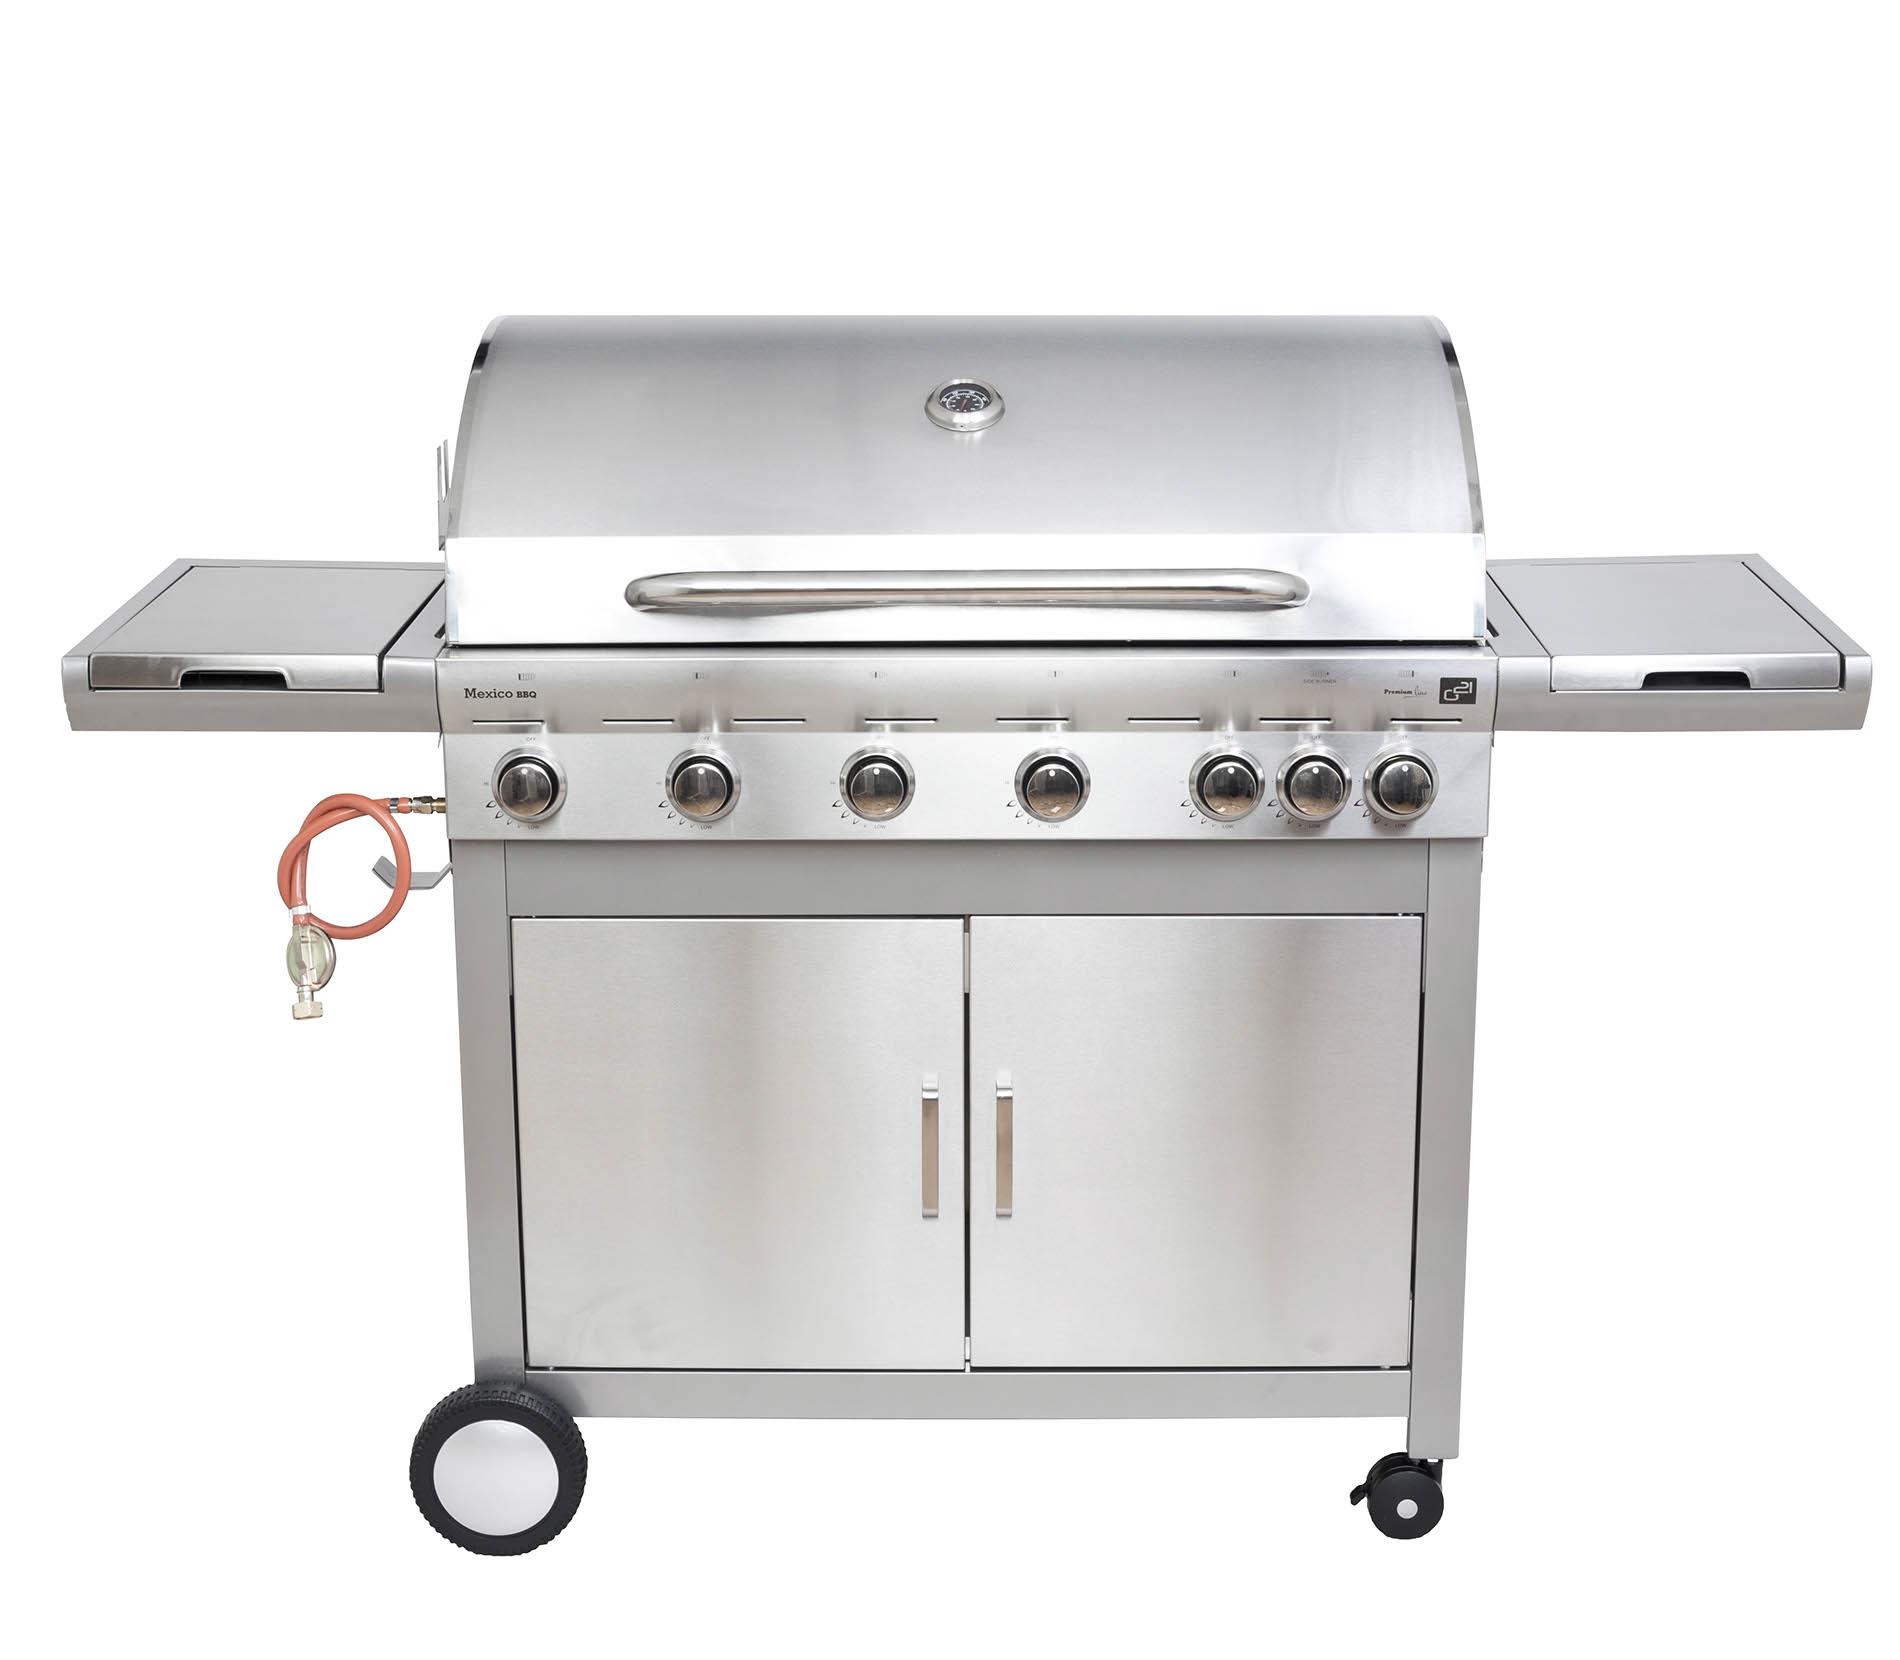 G21 Mexico BBQ Premium line; 6390306